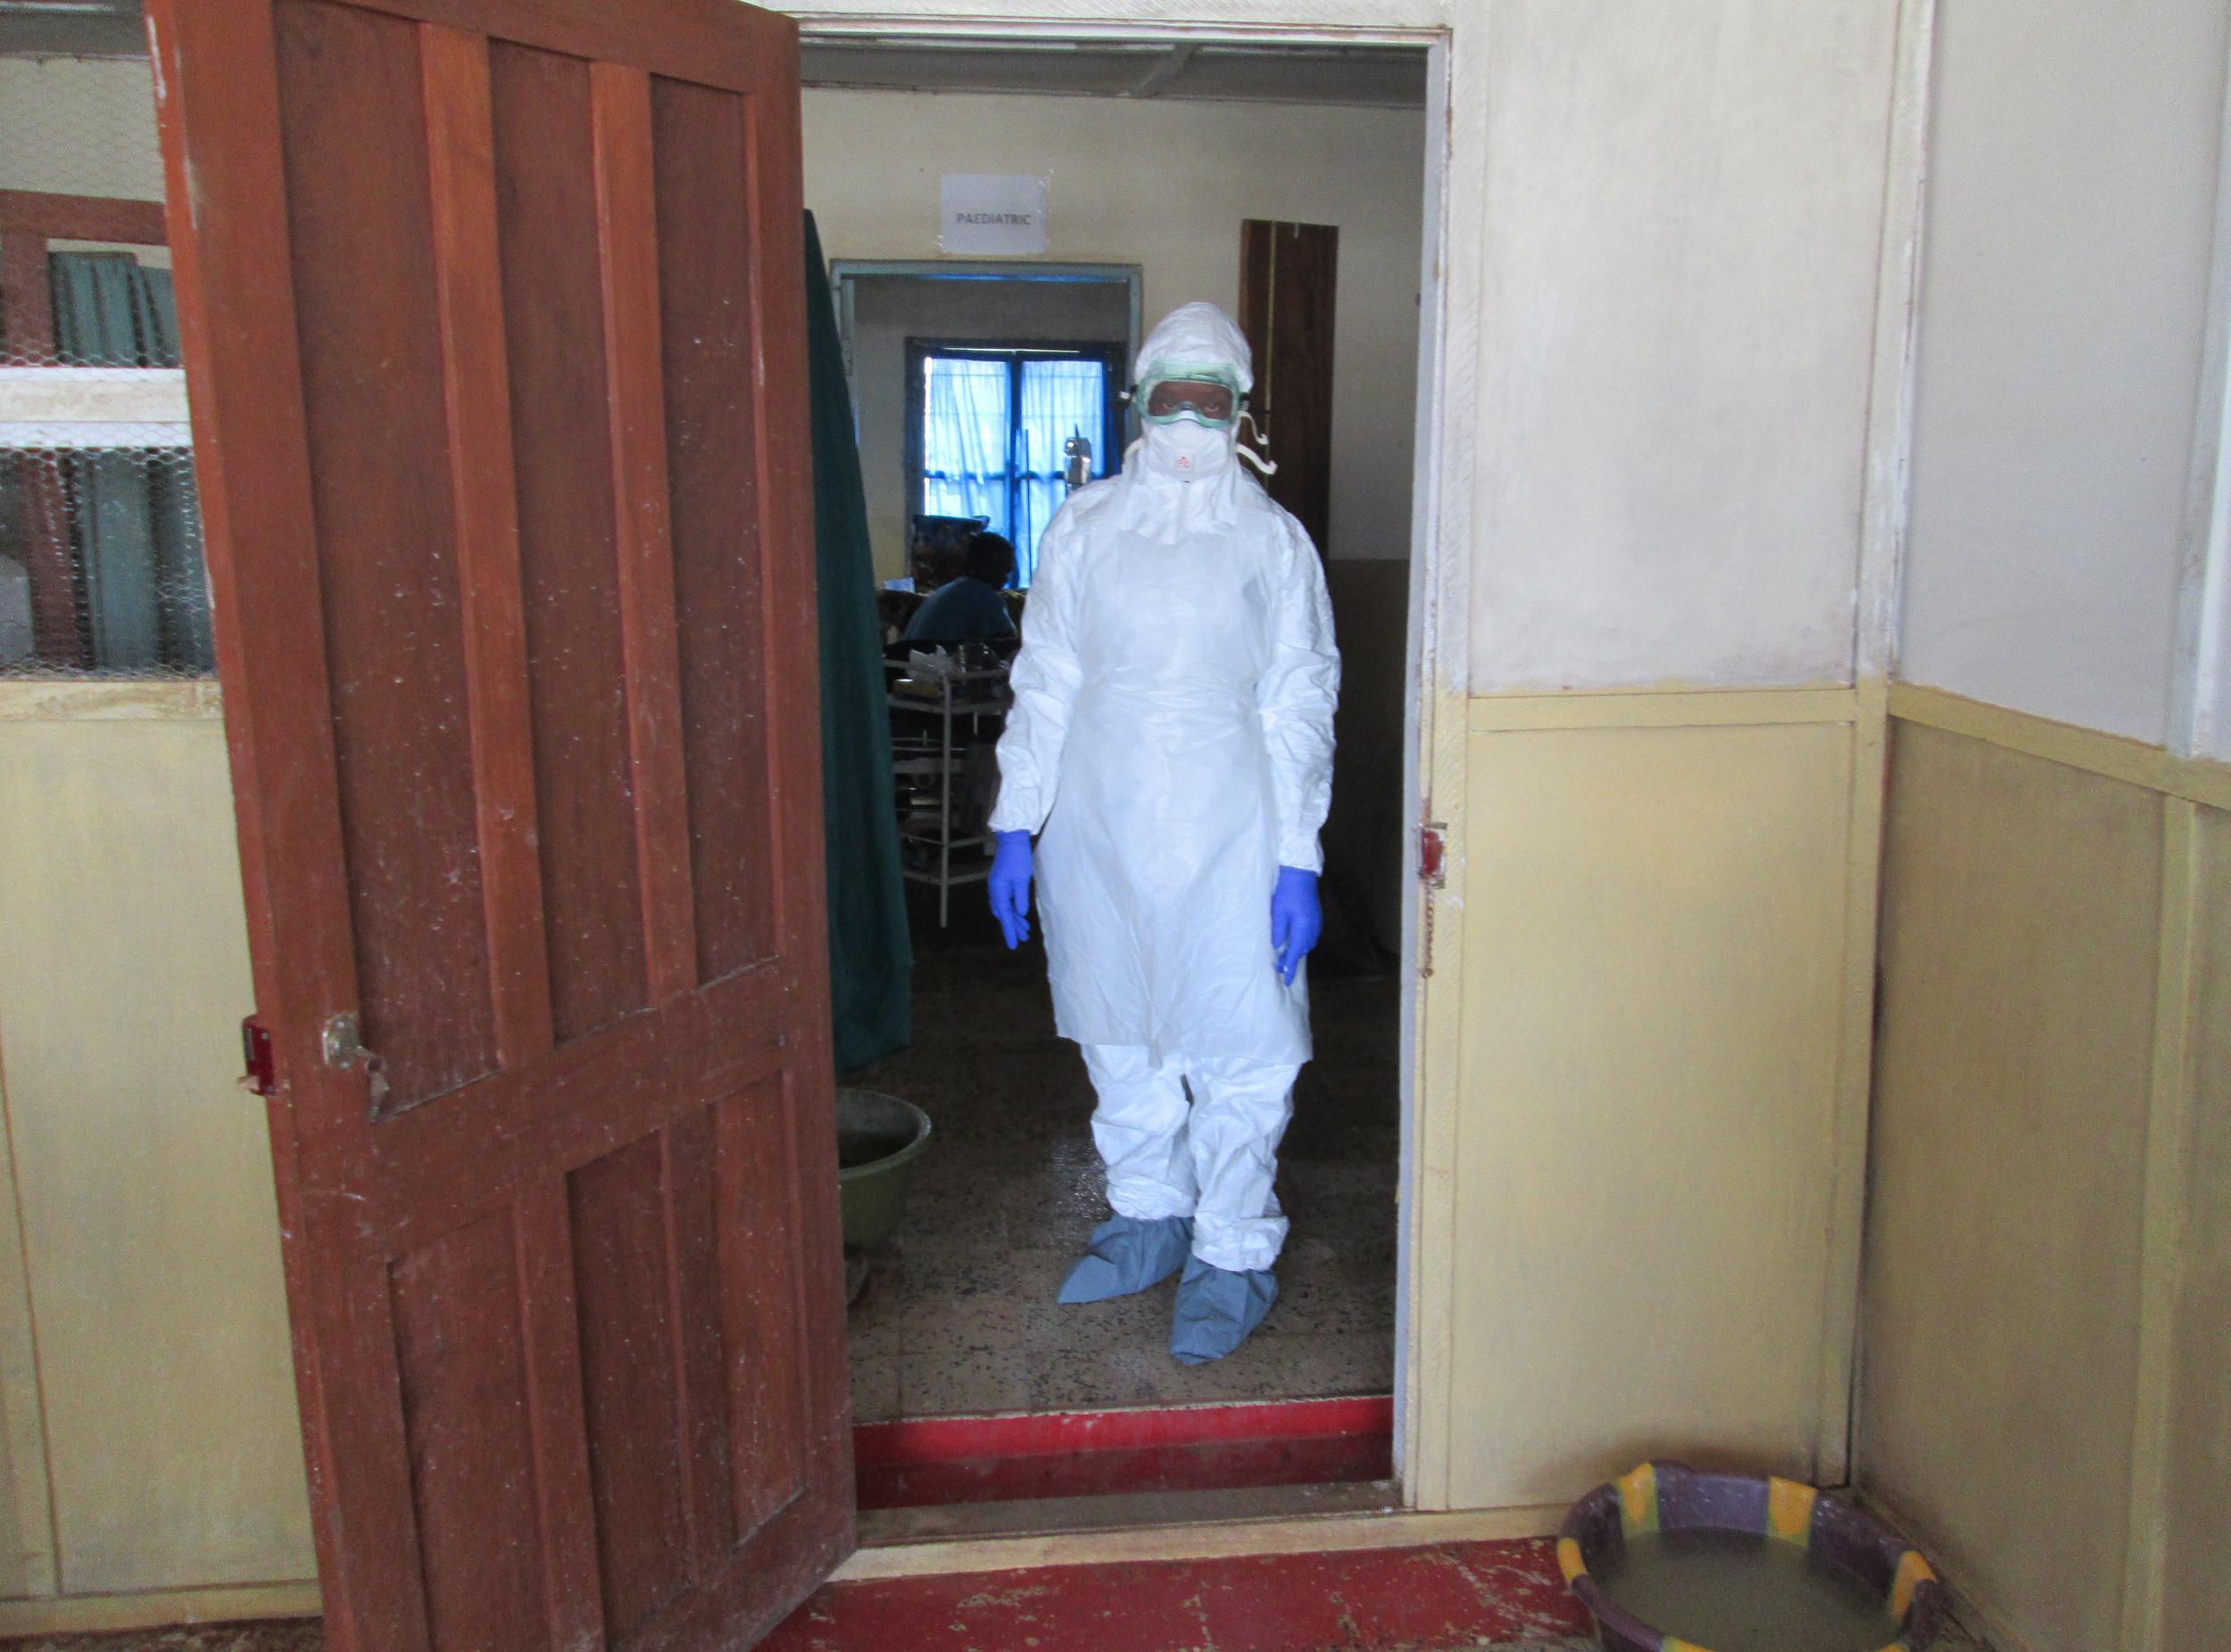 Nurse Veronica Koroma stands in the doorway of the Viral Hemorrhagic Fever (VHF)  ward at Kenema Government Hospital in Sierra Leone.